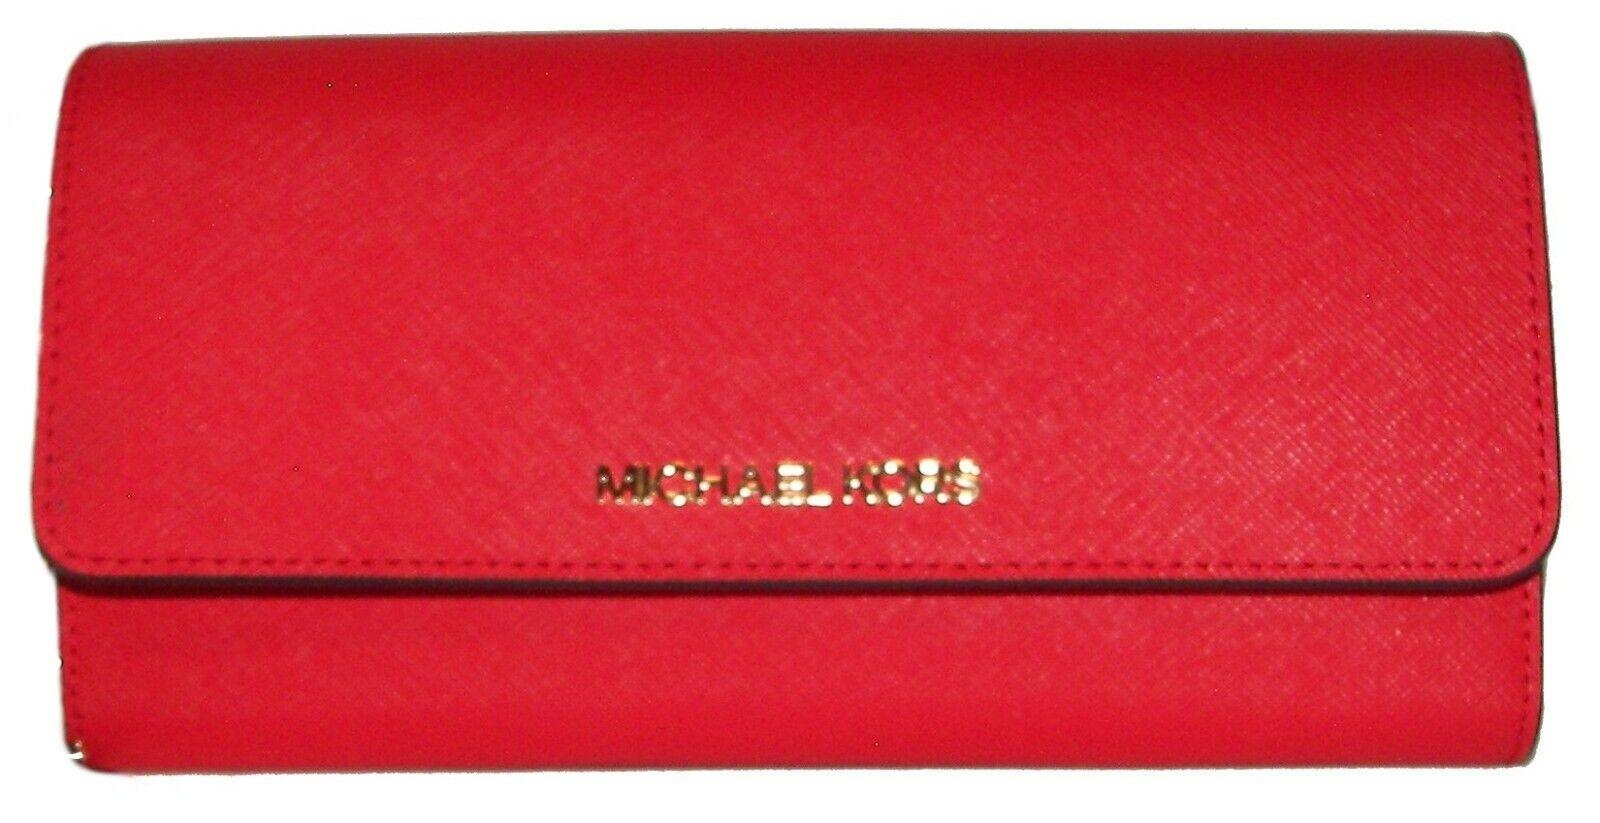 MICHAEL KORS Dark Sangria Flap Clutch Wallet Purse Crossbody NWT